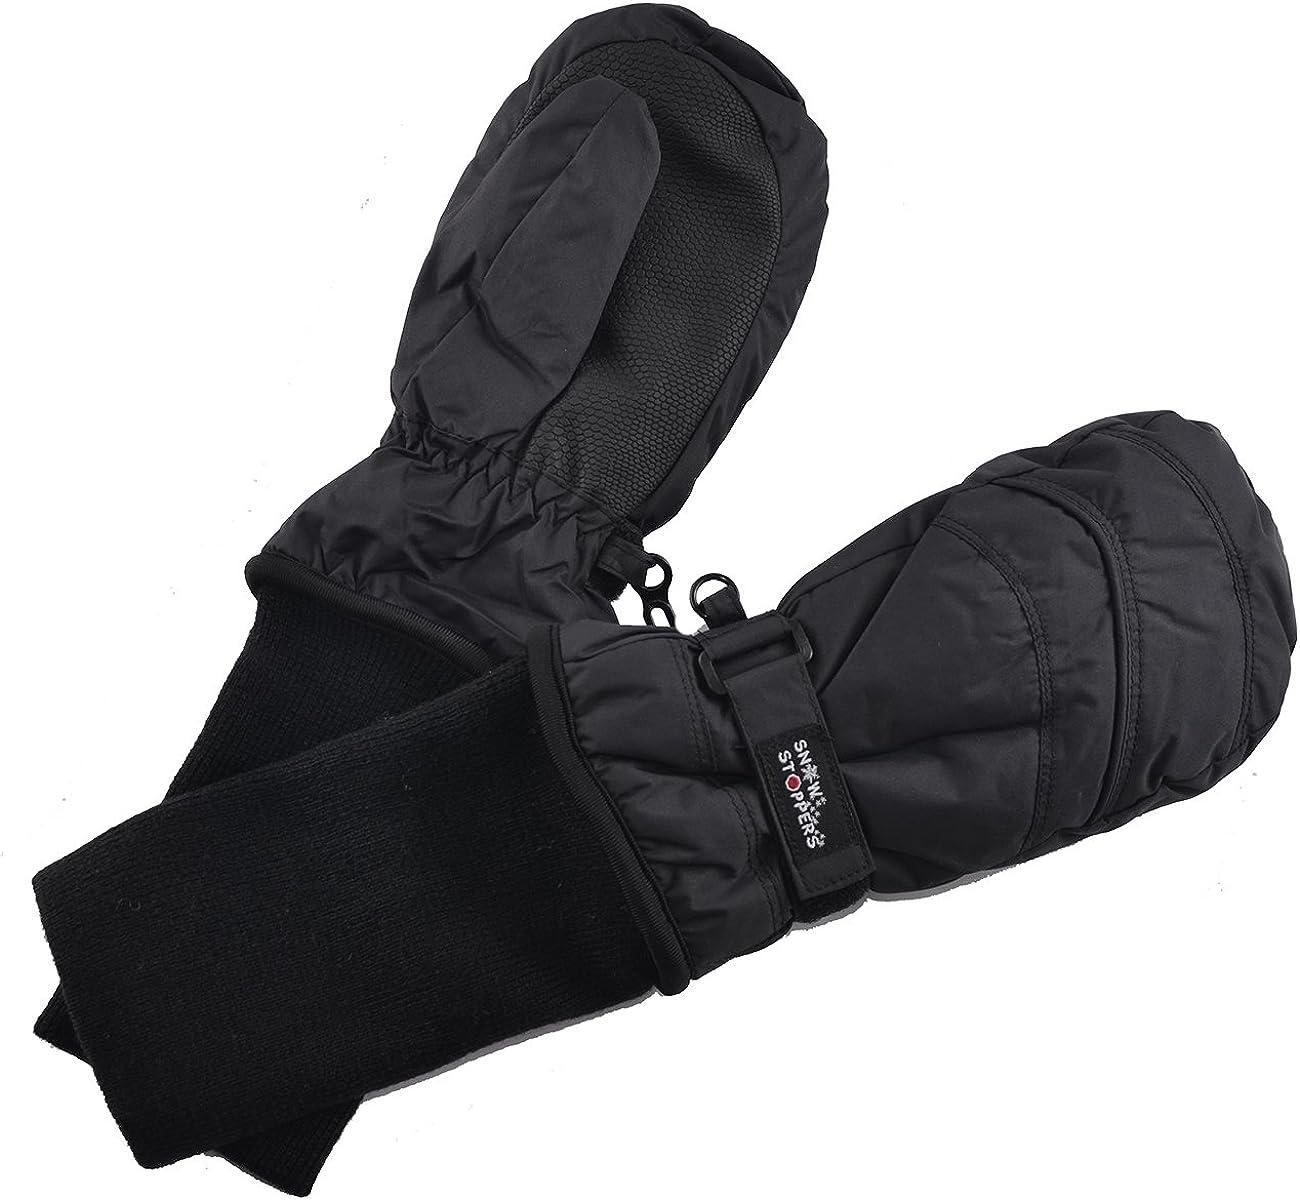 Long-sleeved Mitten Snow Snowboard Windproof Waterproof Children Ski Gloves